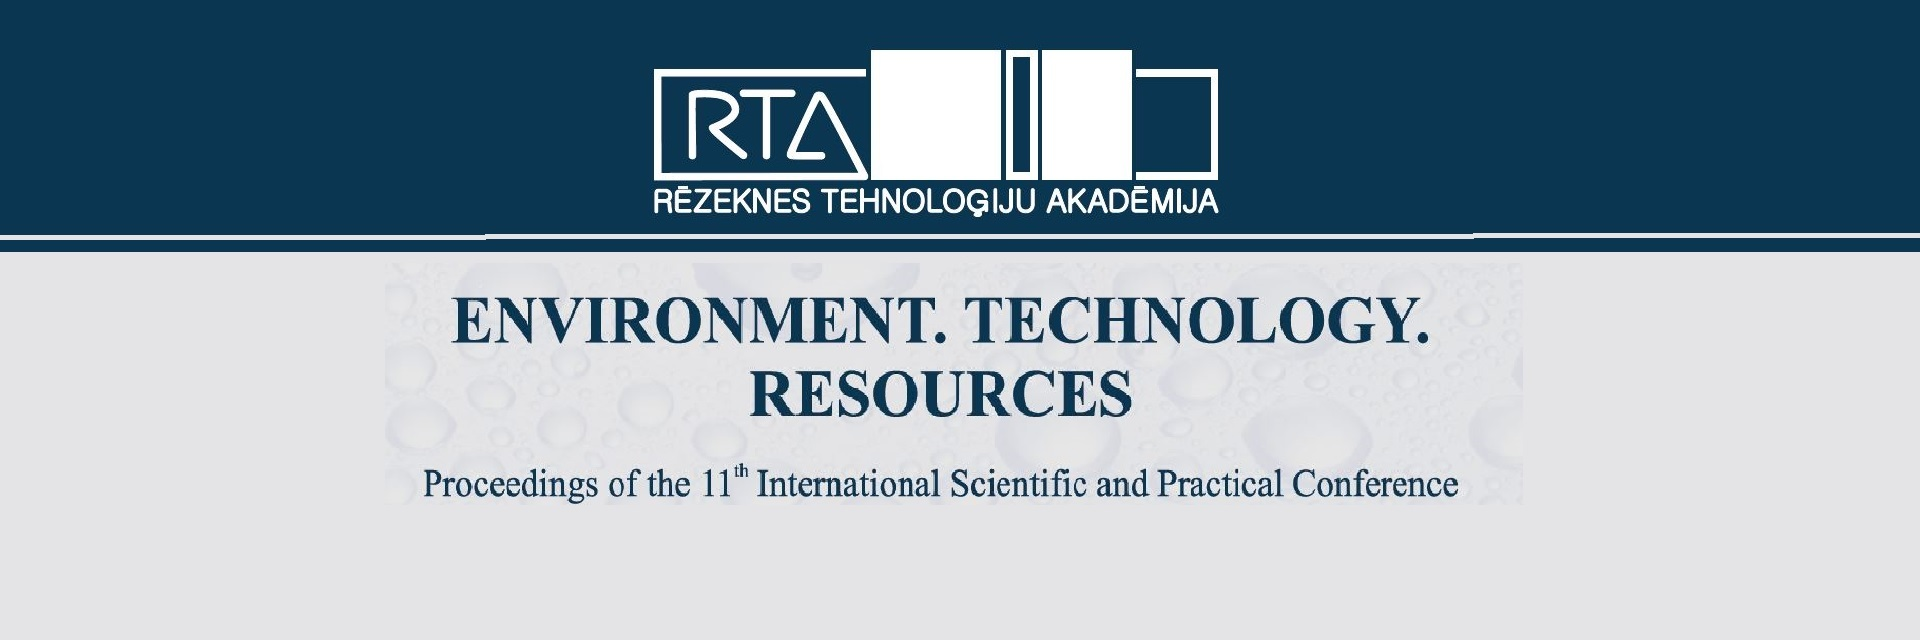 Vide.Tehnoloģija.Resursi